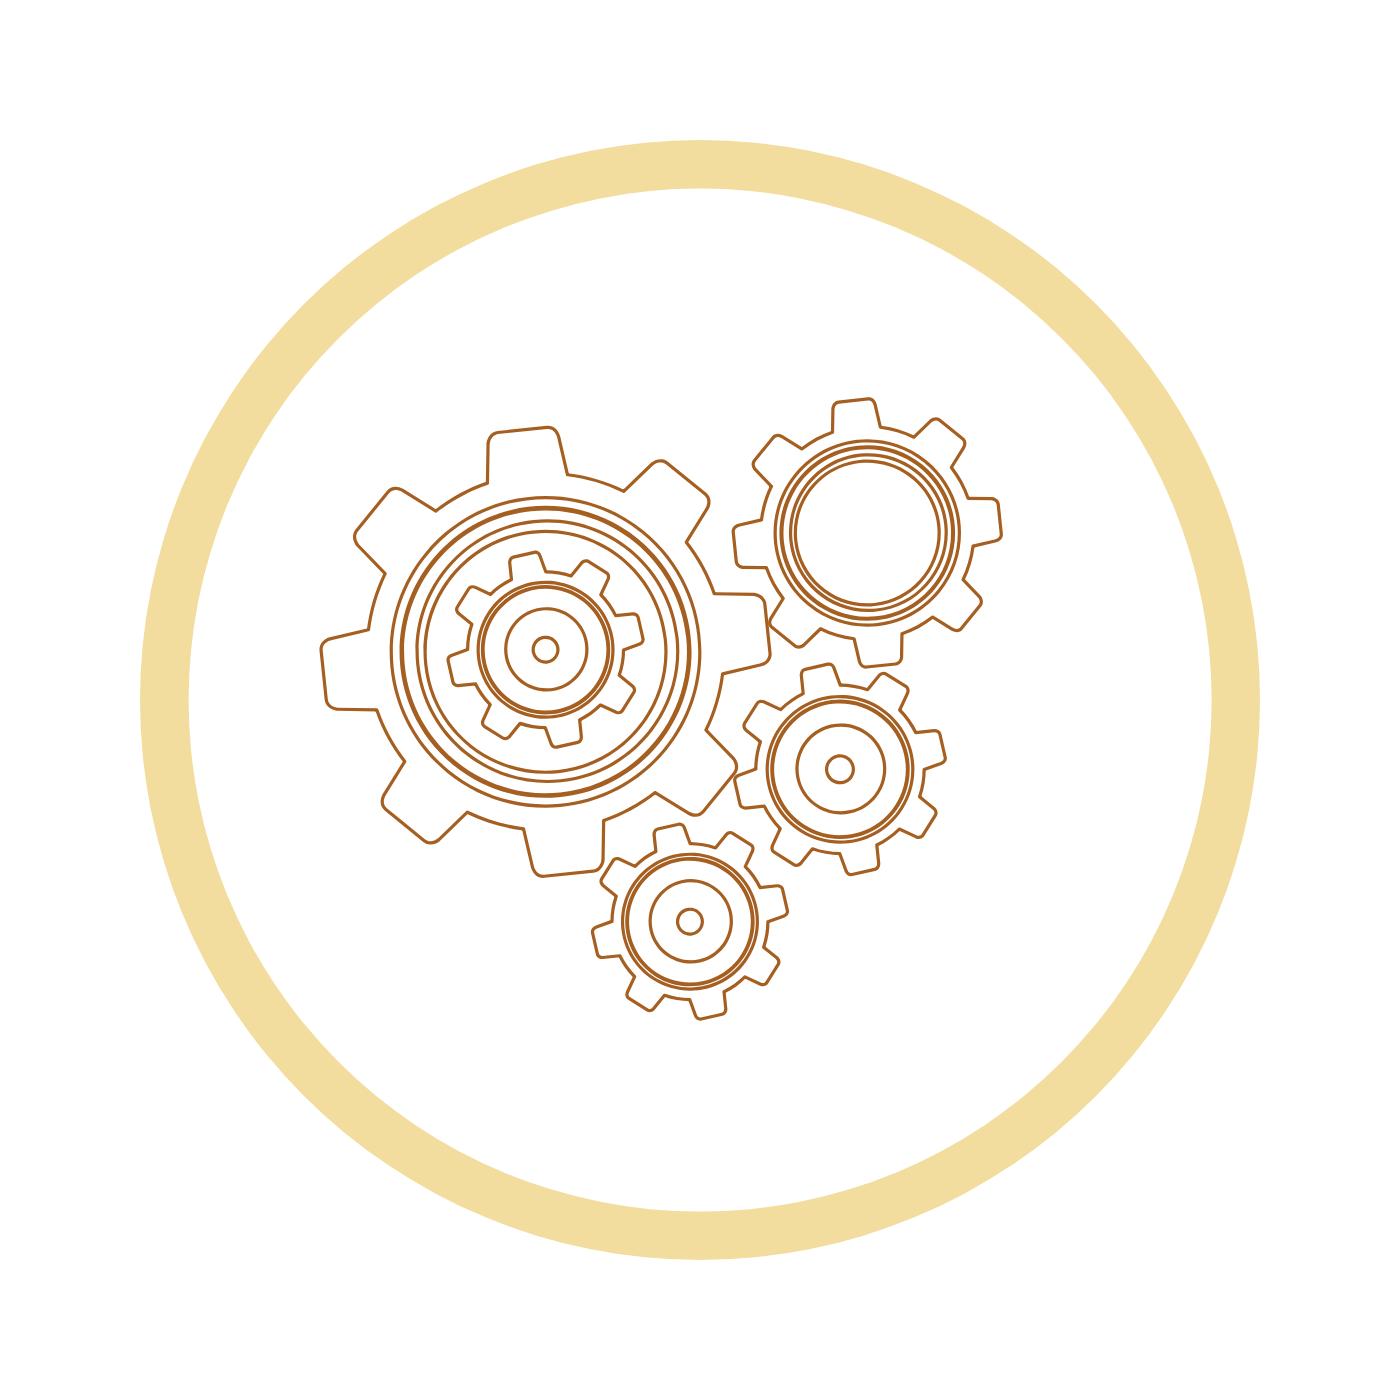 100.png (6.0kB) Lien vers: OrganisationCooperative